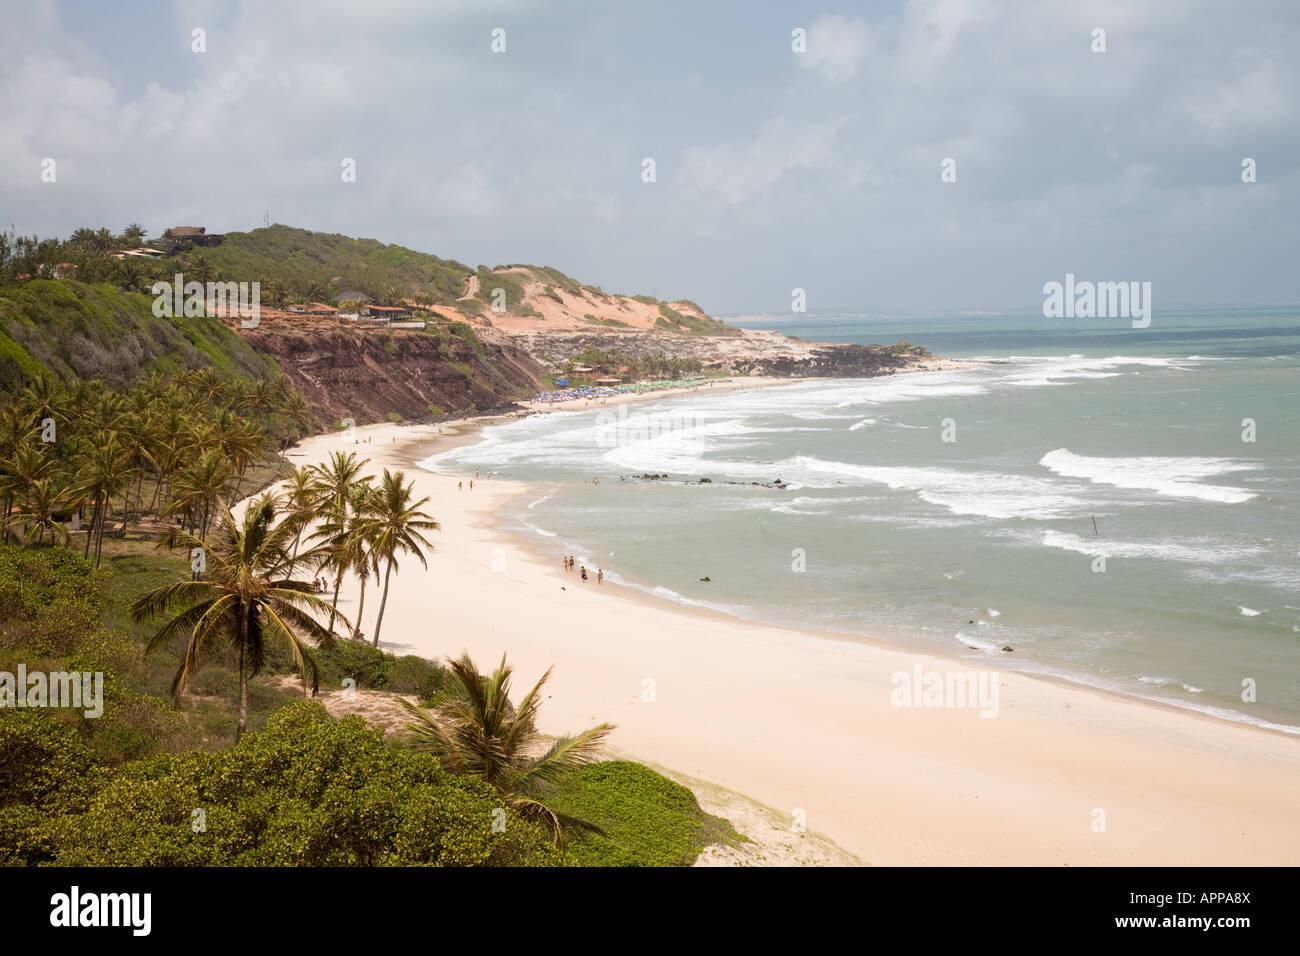 Pipa, la playa Praia do Amor, Rio Grande do Norte, Brasil Imagen De Stock